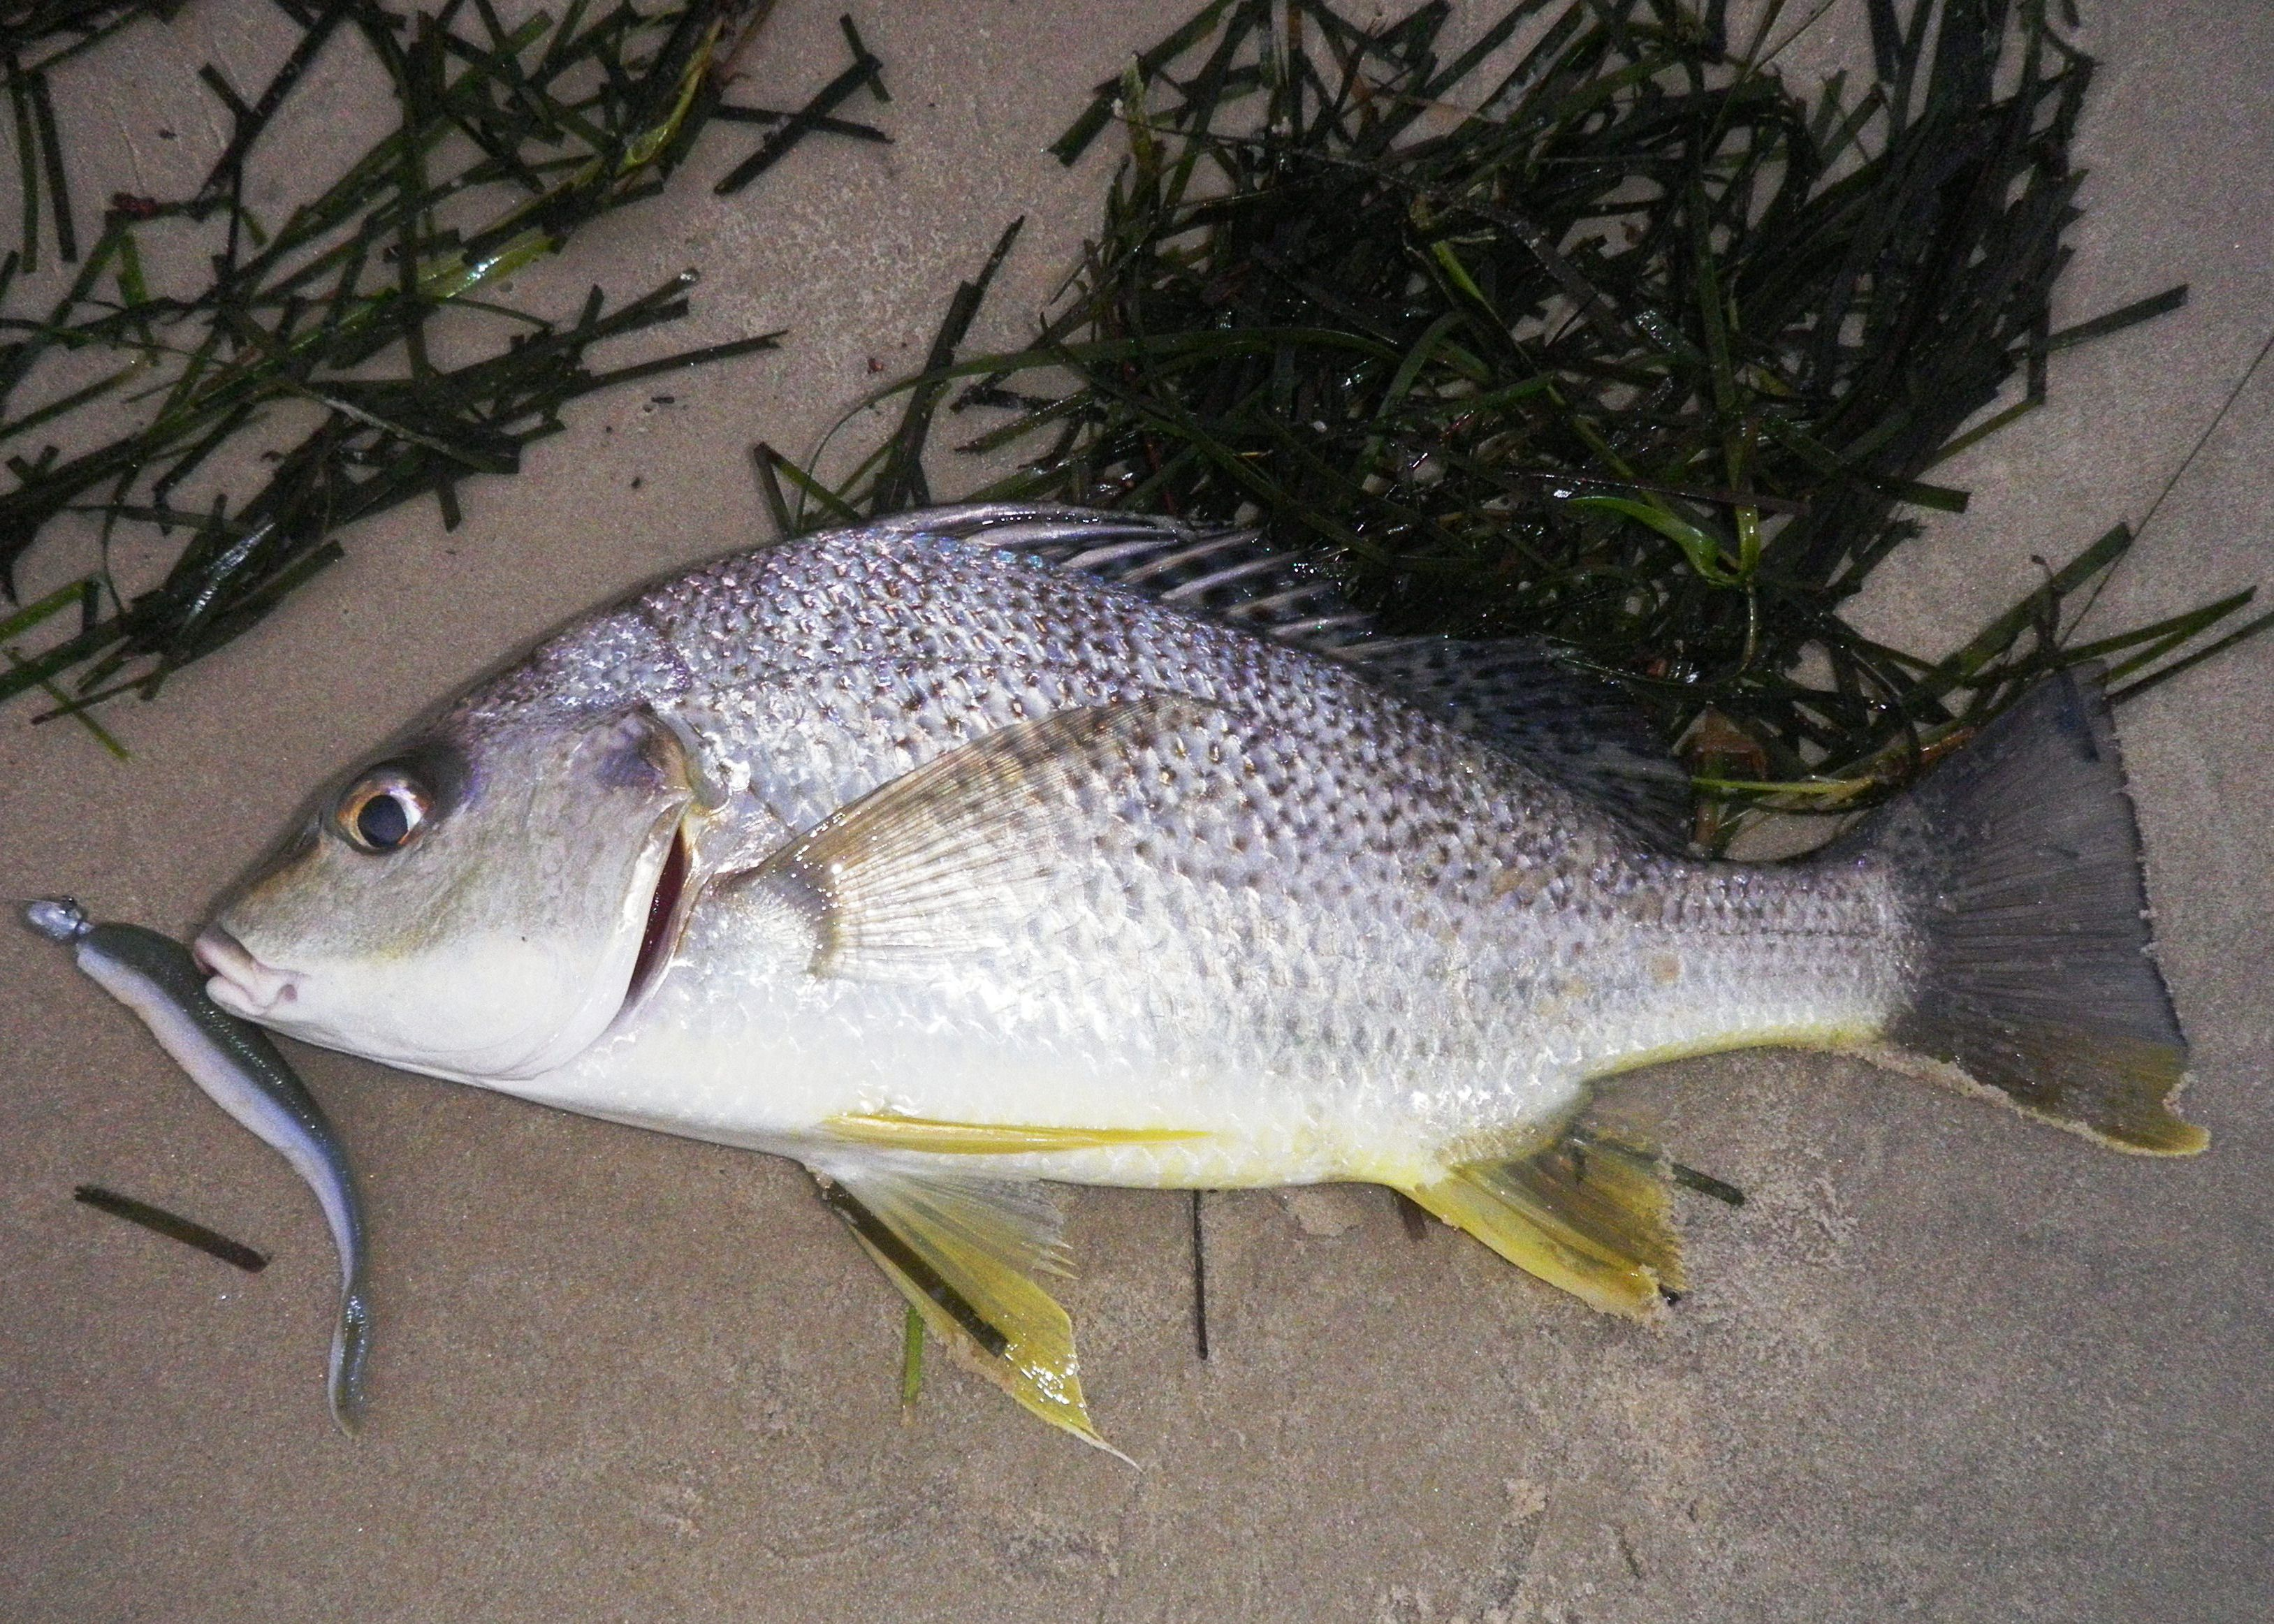 Caloundra fish 07 02 2012 3 grunter bream 35cm for Public fishing spots near me